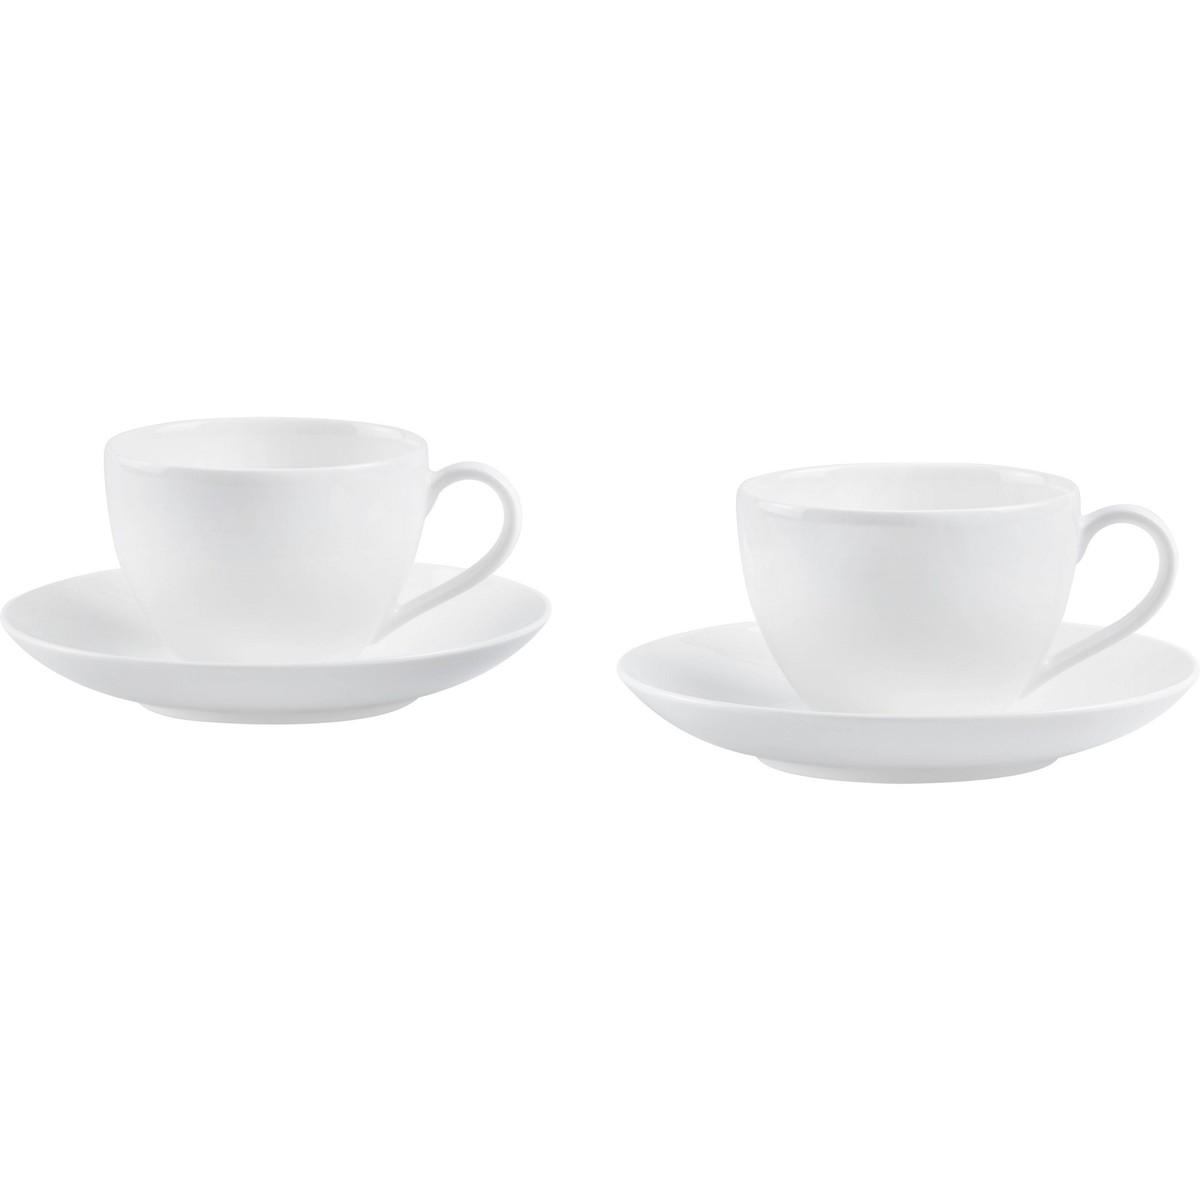 Bild 3 von Kaffeeset Vivo Hot Basics 4-tlg